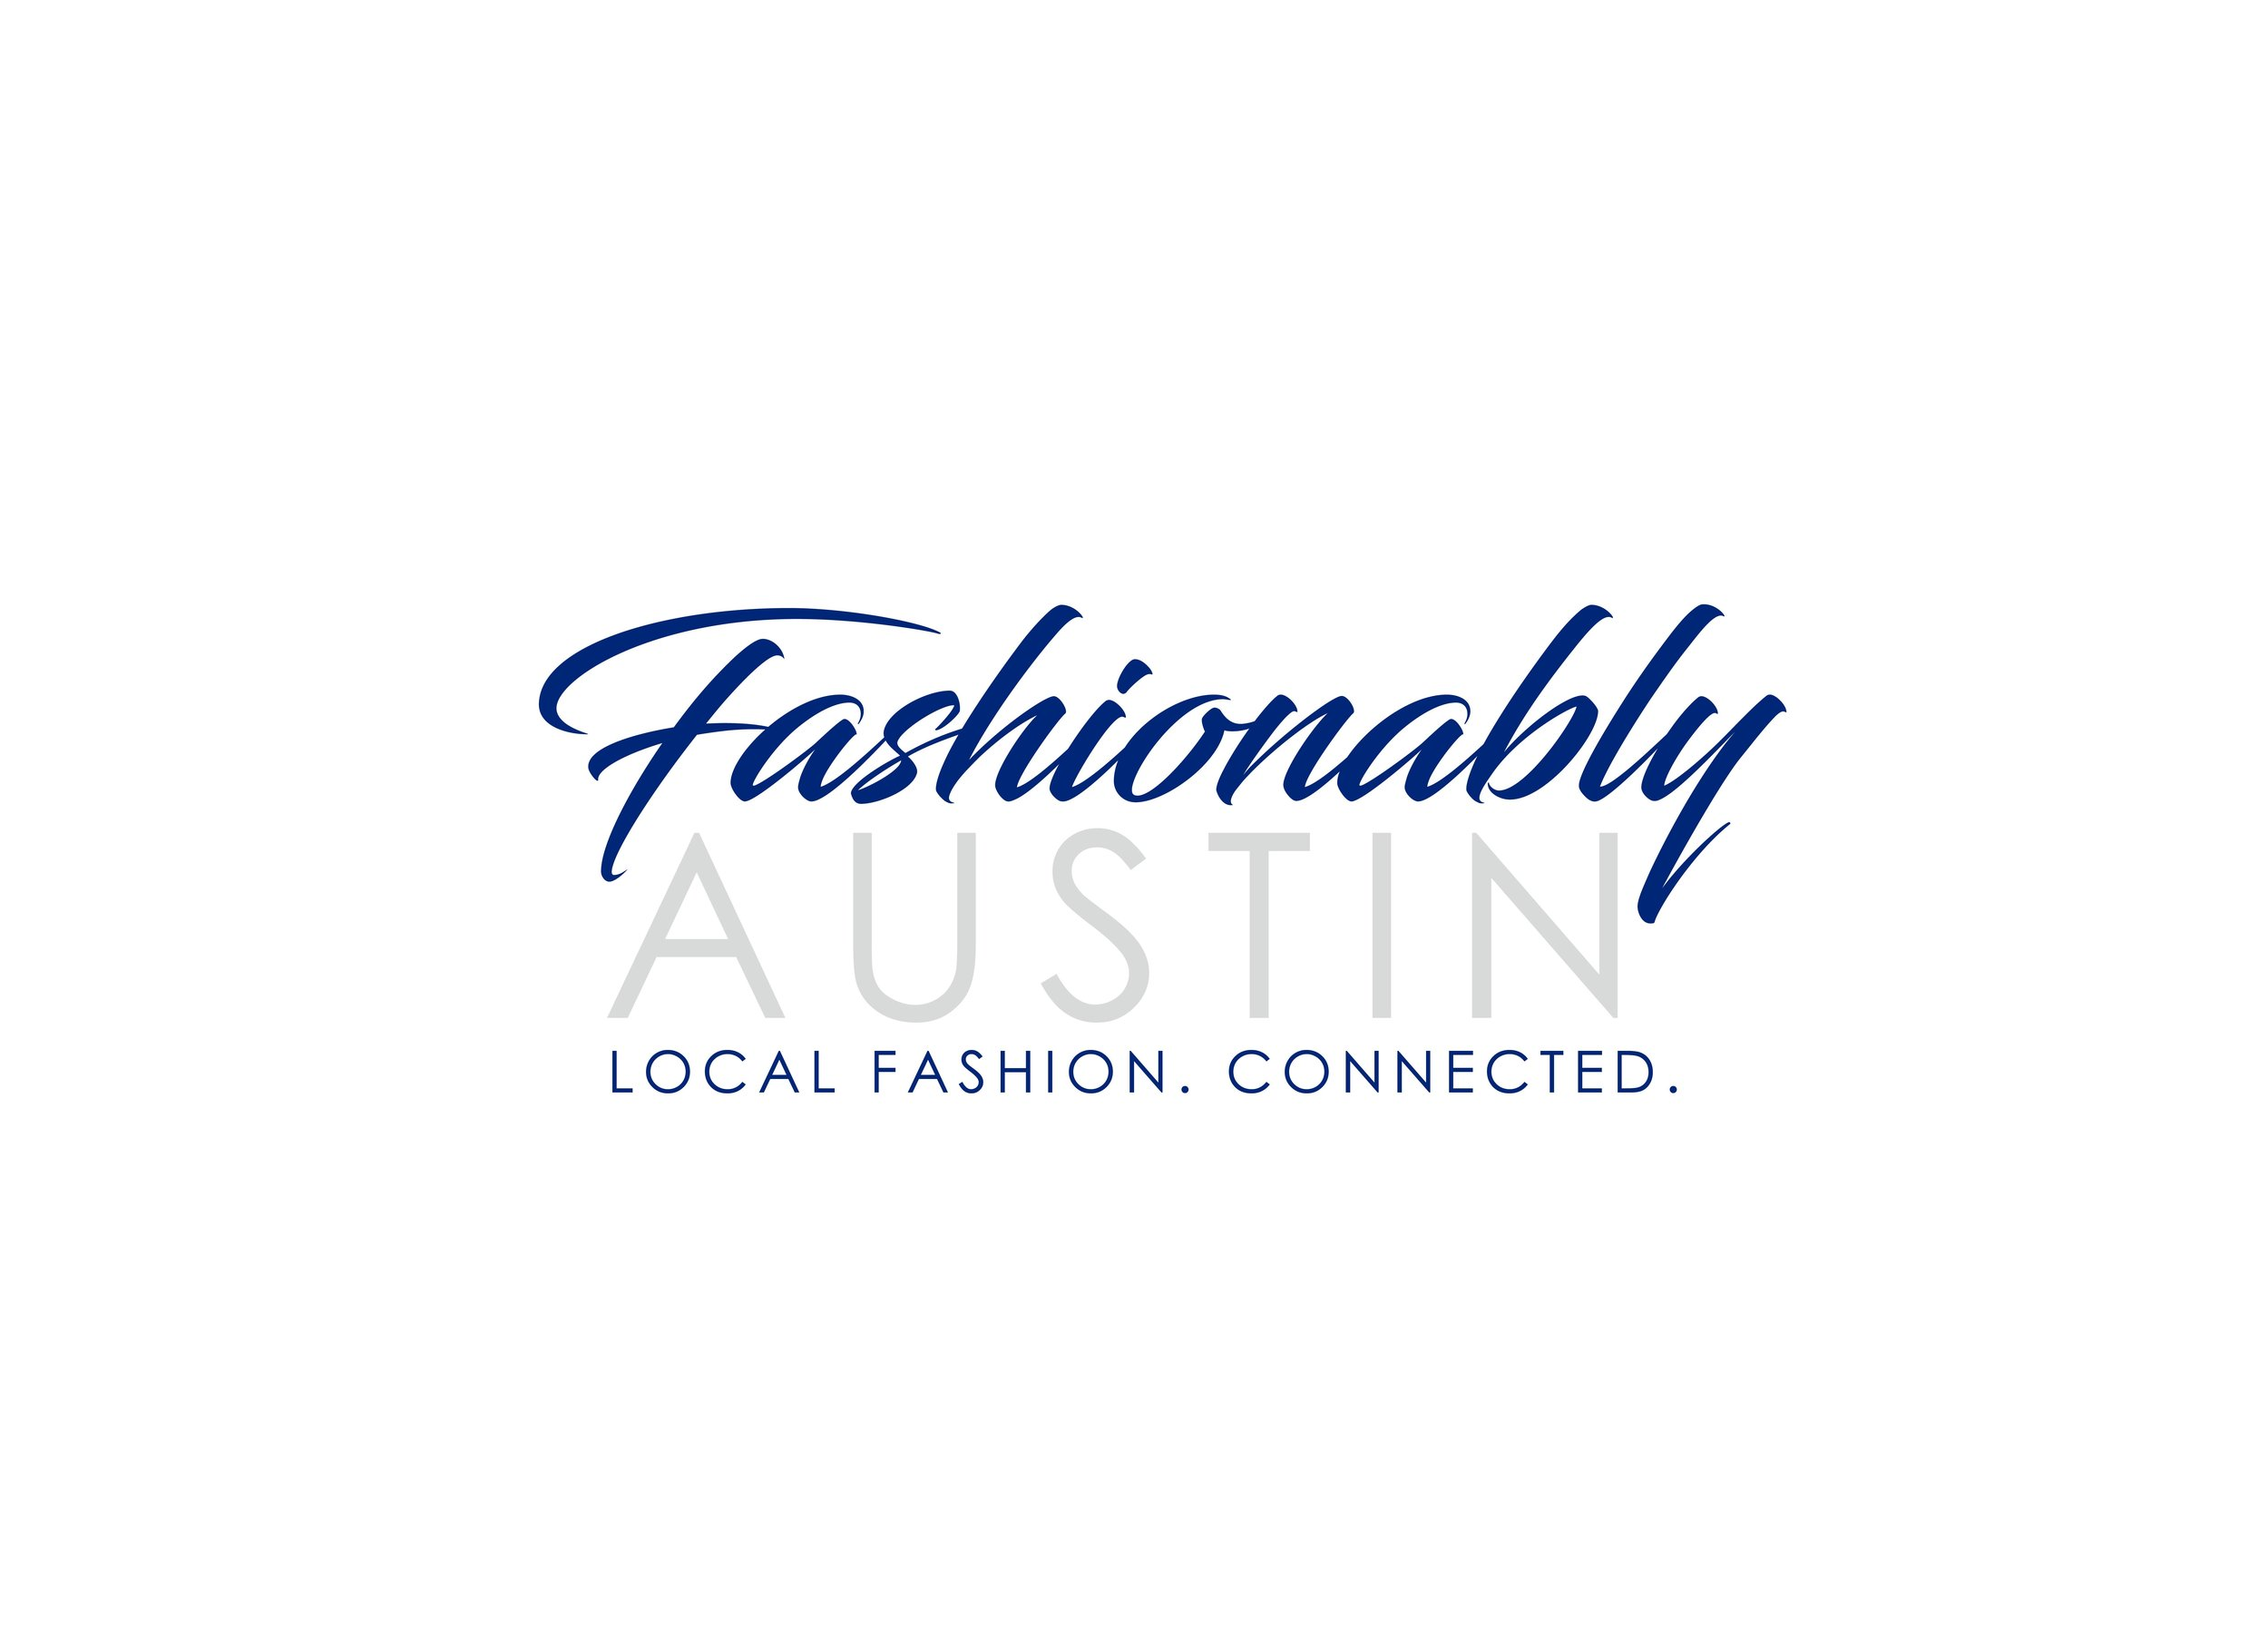 Fashionably Austin logo - Halston.jpg